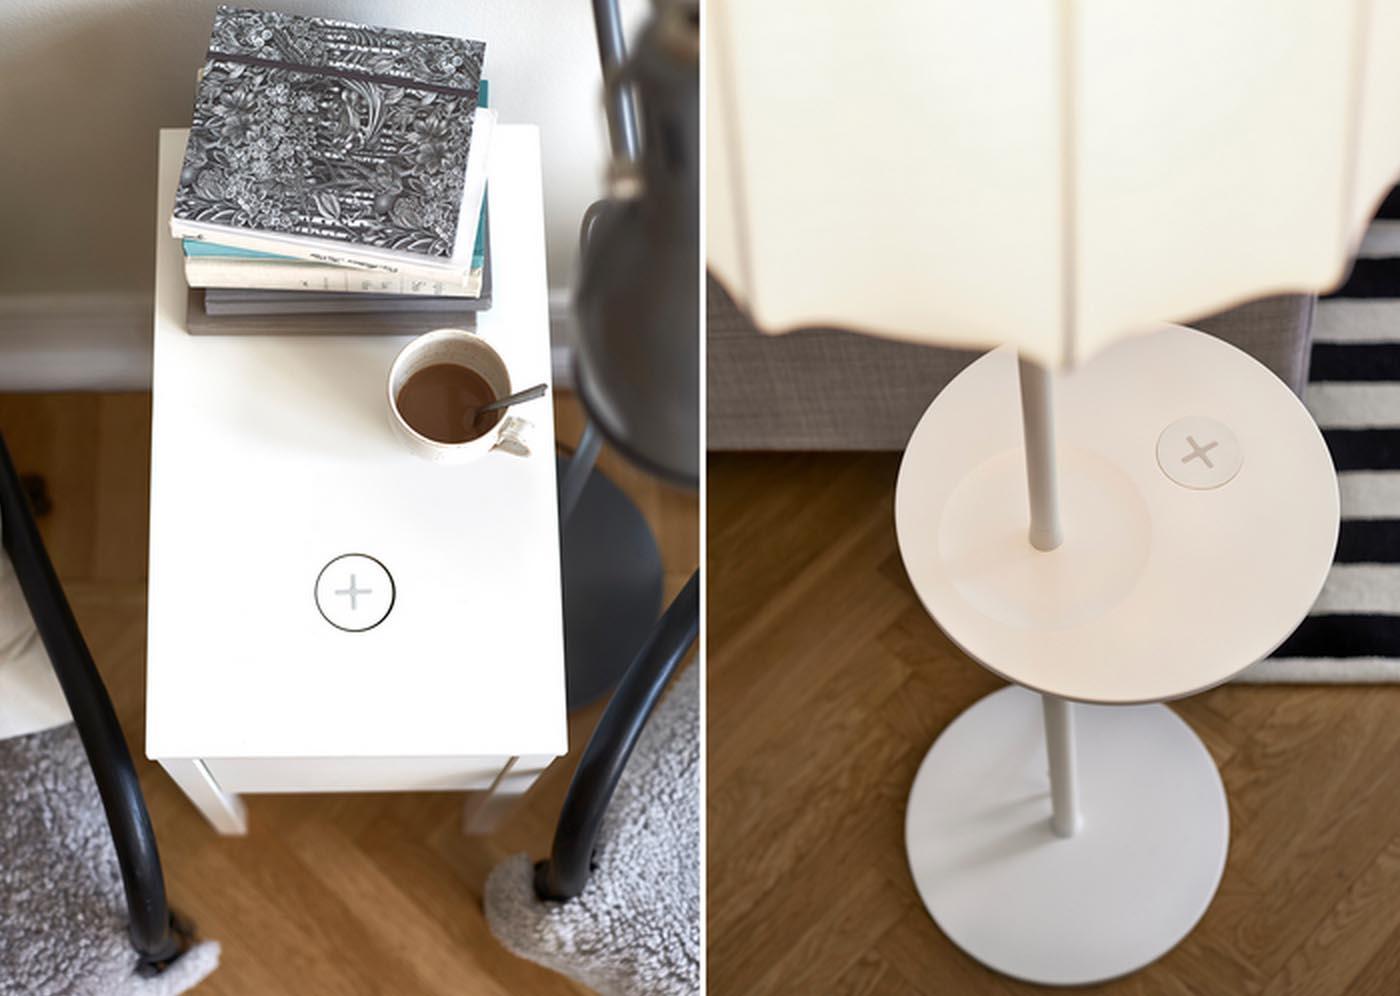 Ikea QI recharge induction